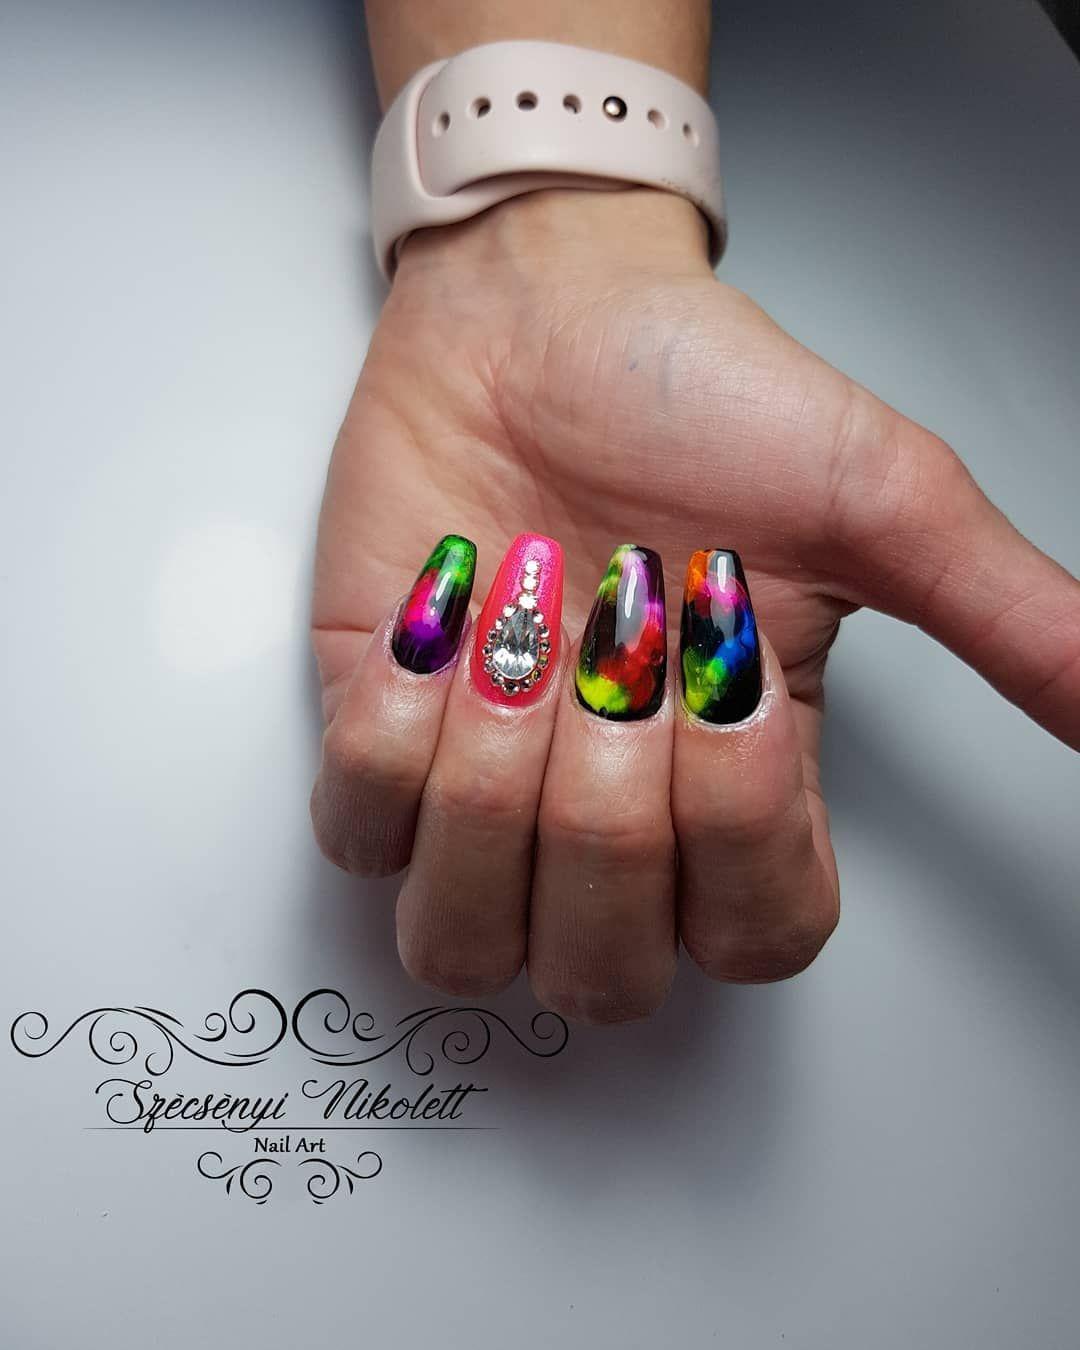 Smokin' Hot Neon Smoke Nail Art Designs | Nail art designs ...